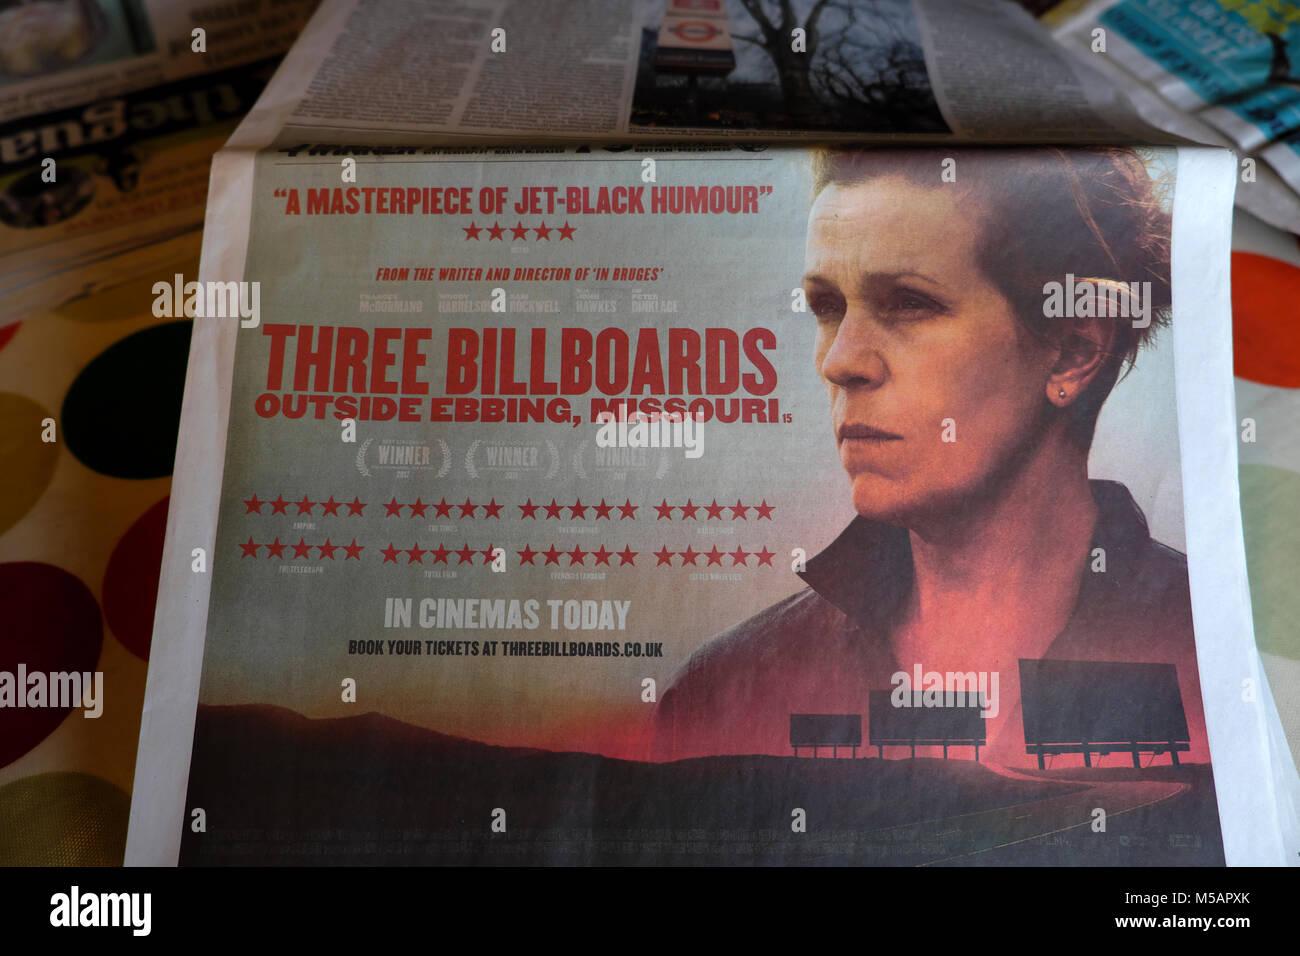 Three Billboards Outside Ebbing, Missouri Oscar Award Winning movie advert in a British newspaper with Hollywood - Stock Image